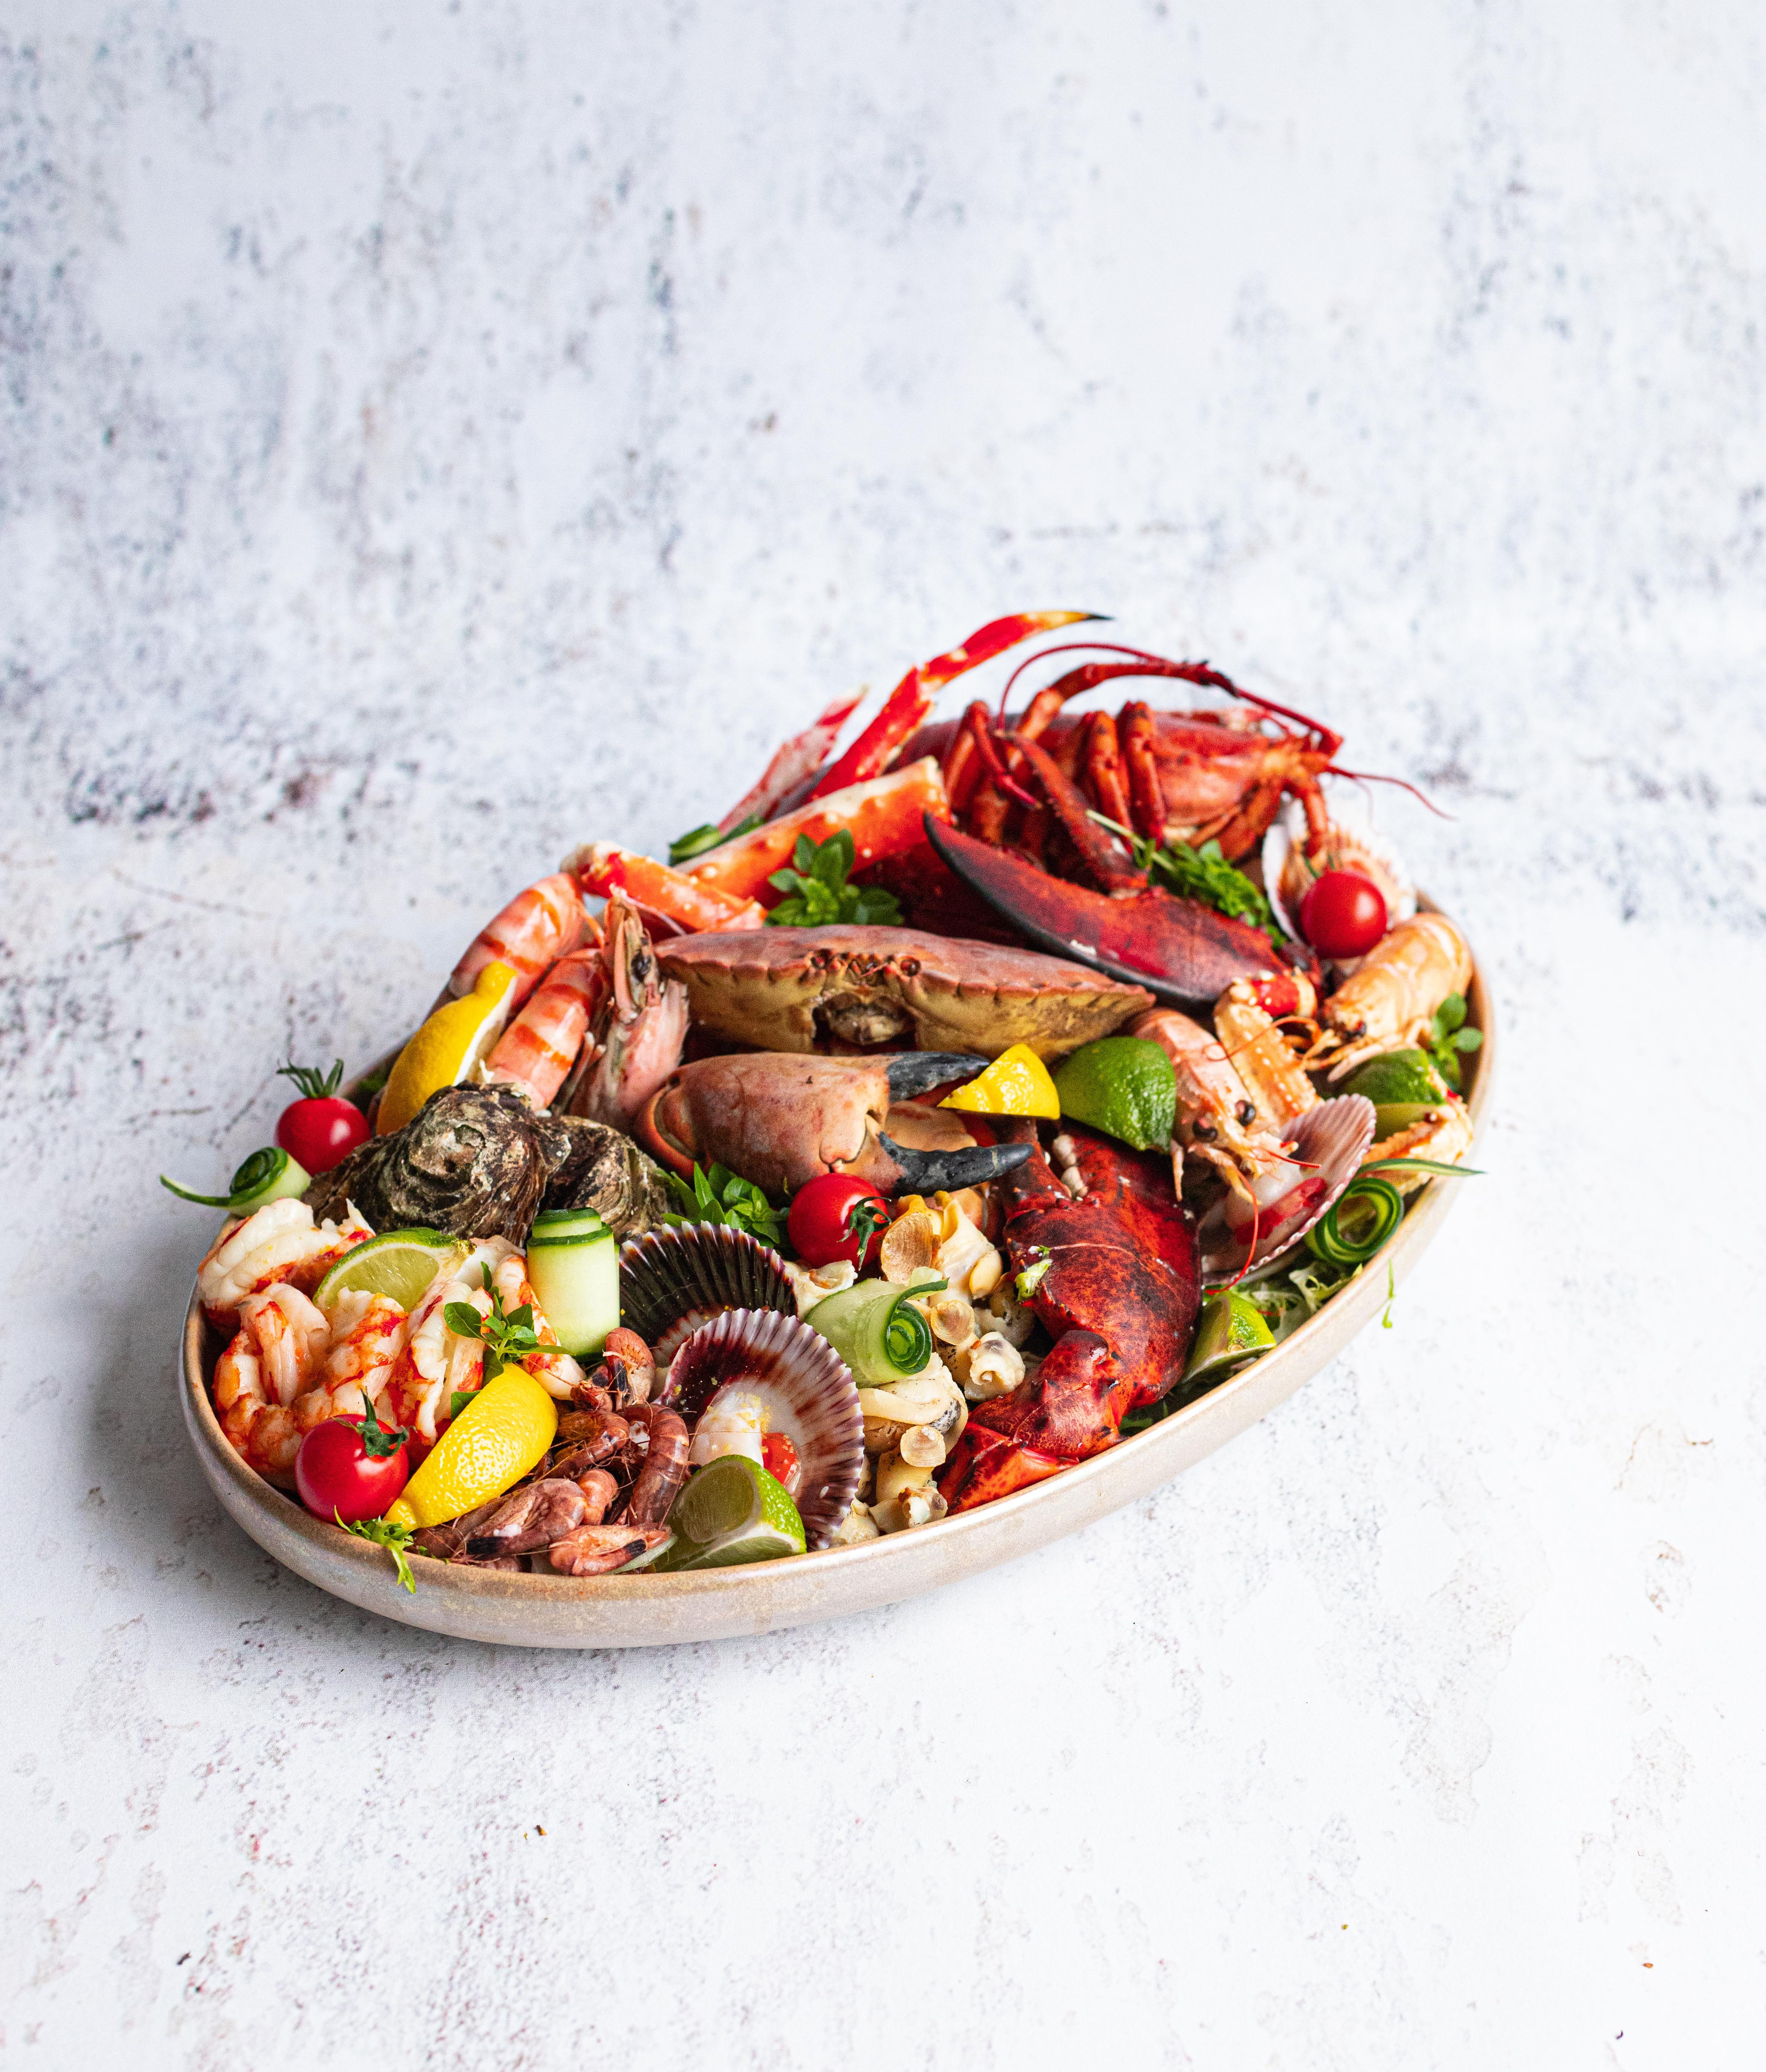 Fruit de mer plateau